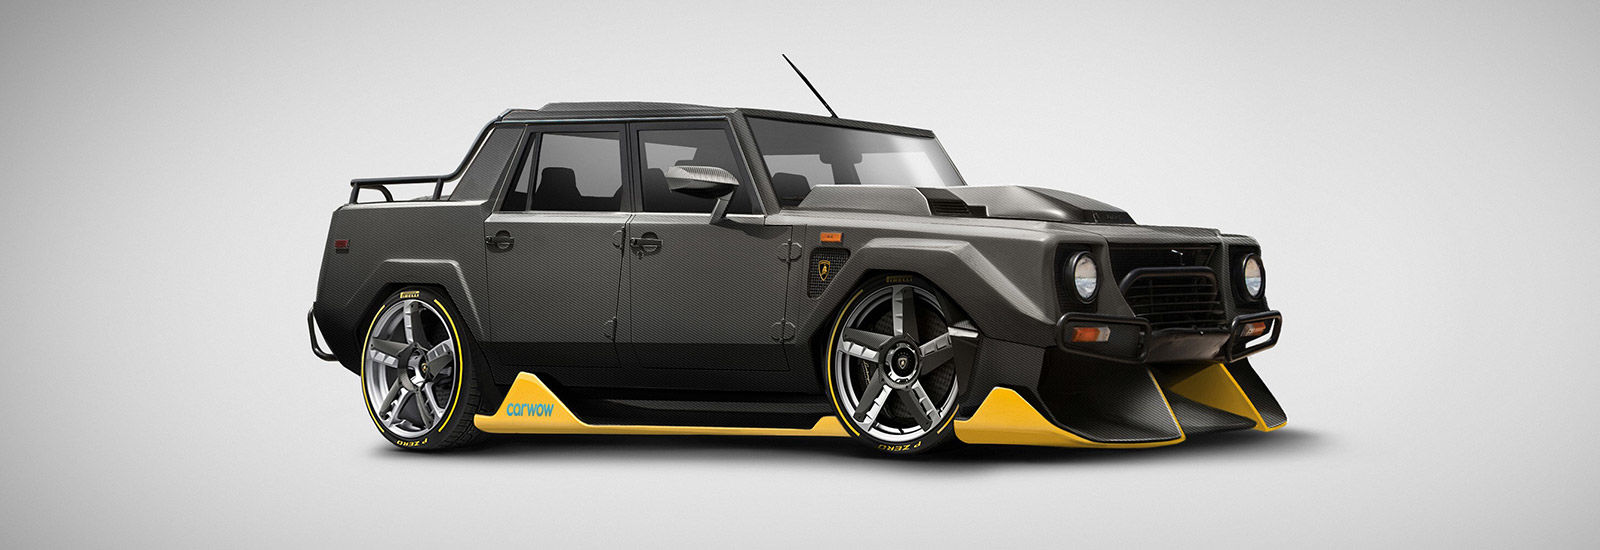 cropped-J-carwow-Lamborghini-Centenari002-carbon